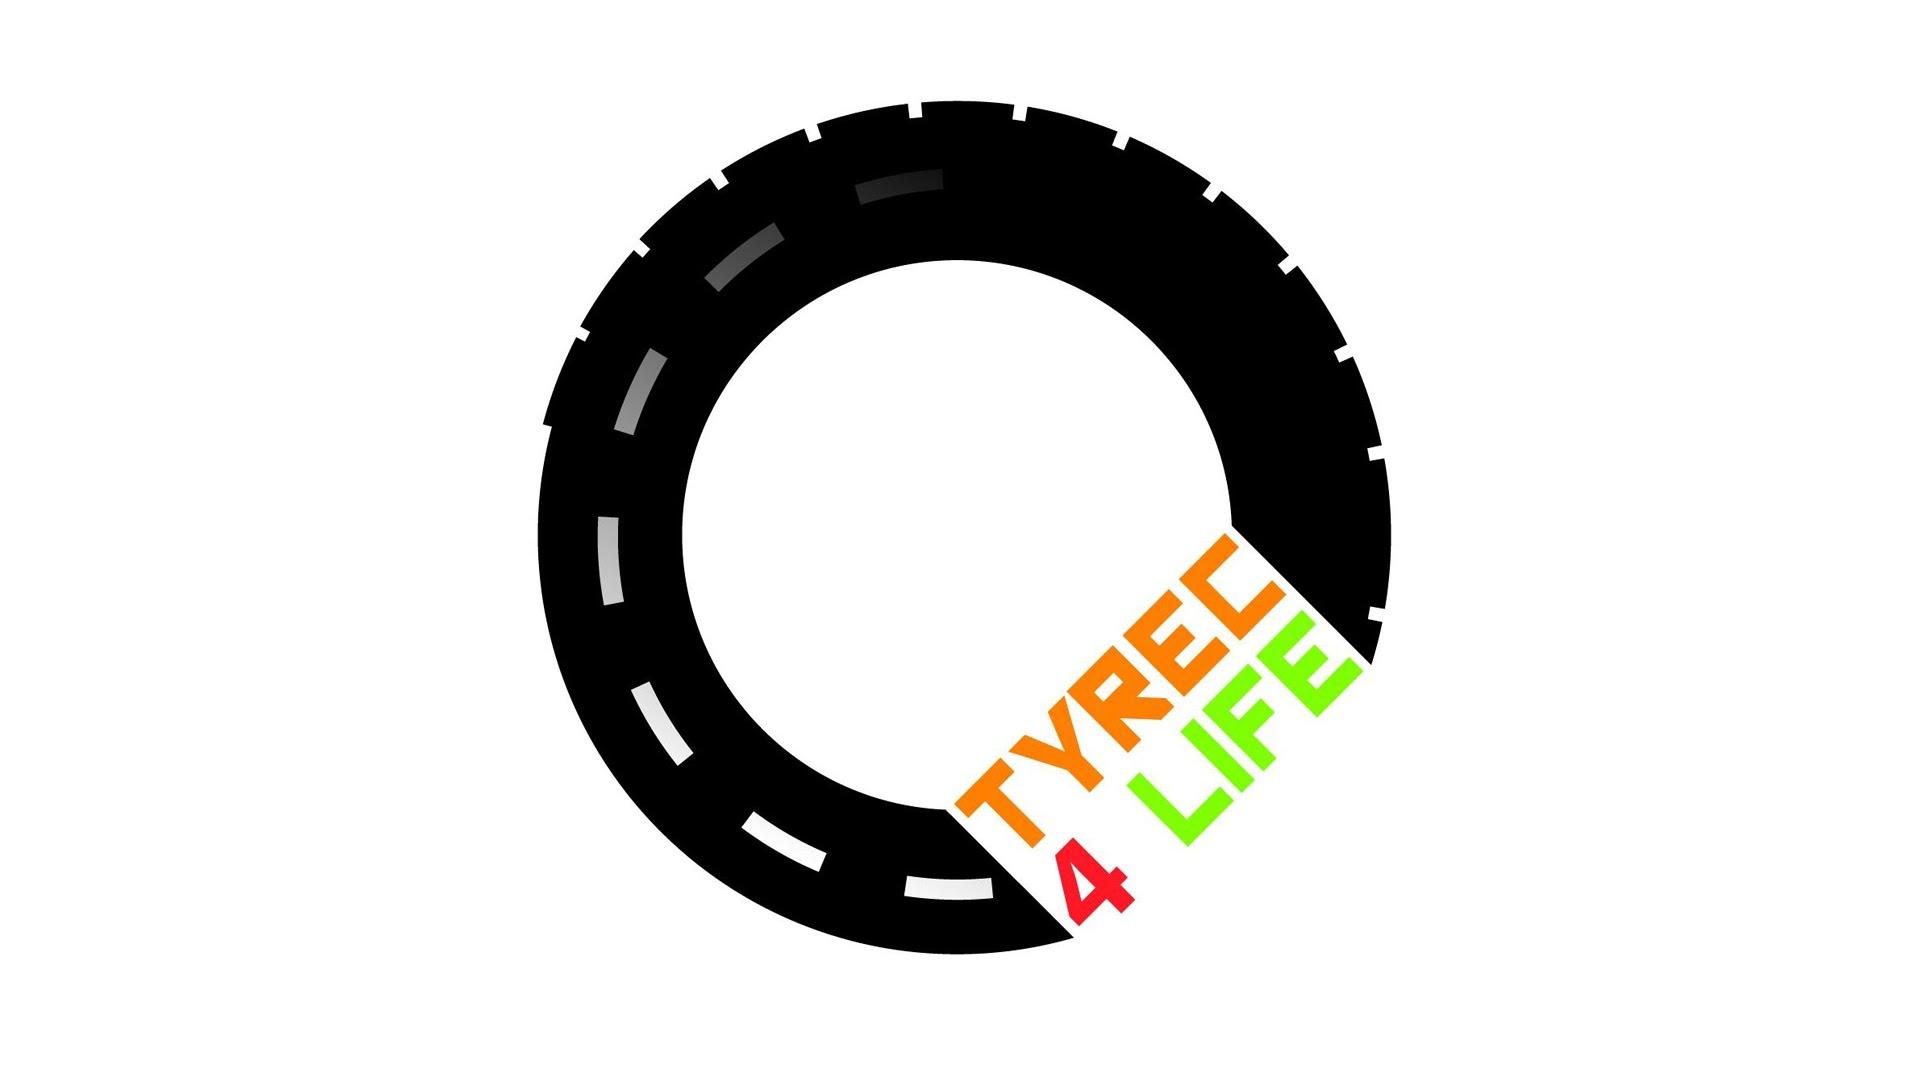 tyrec4life